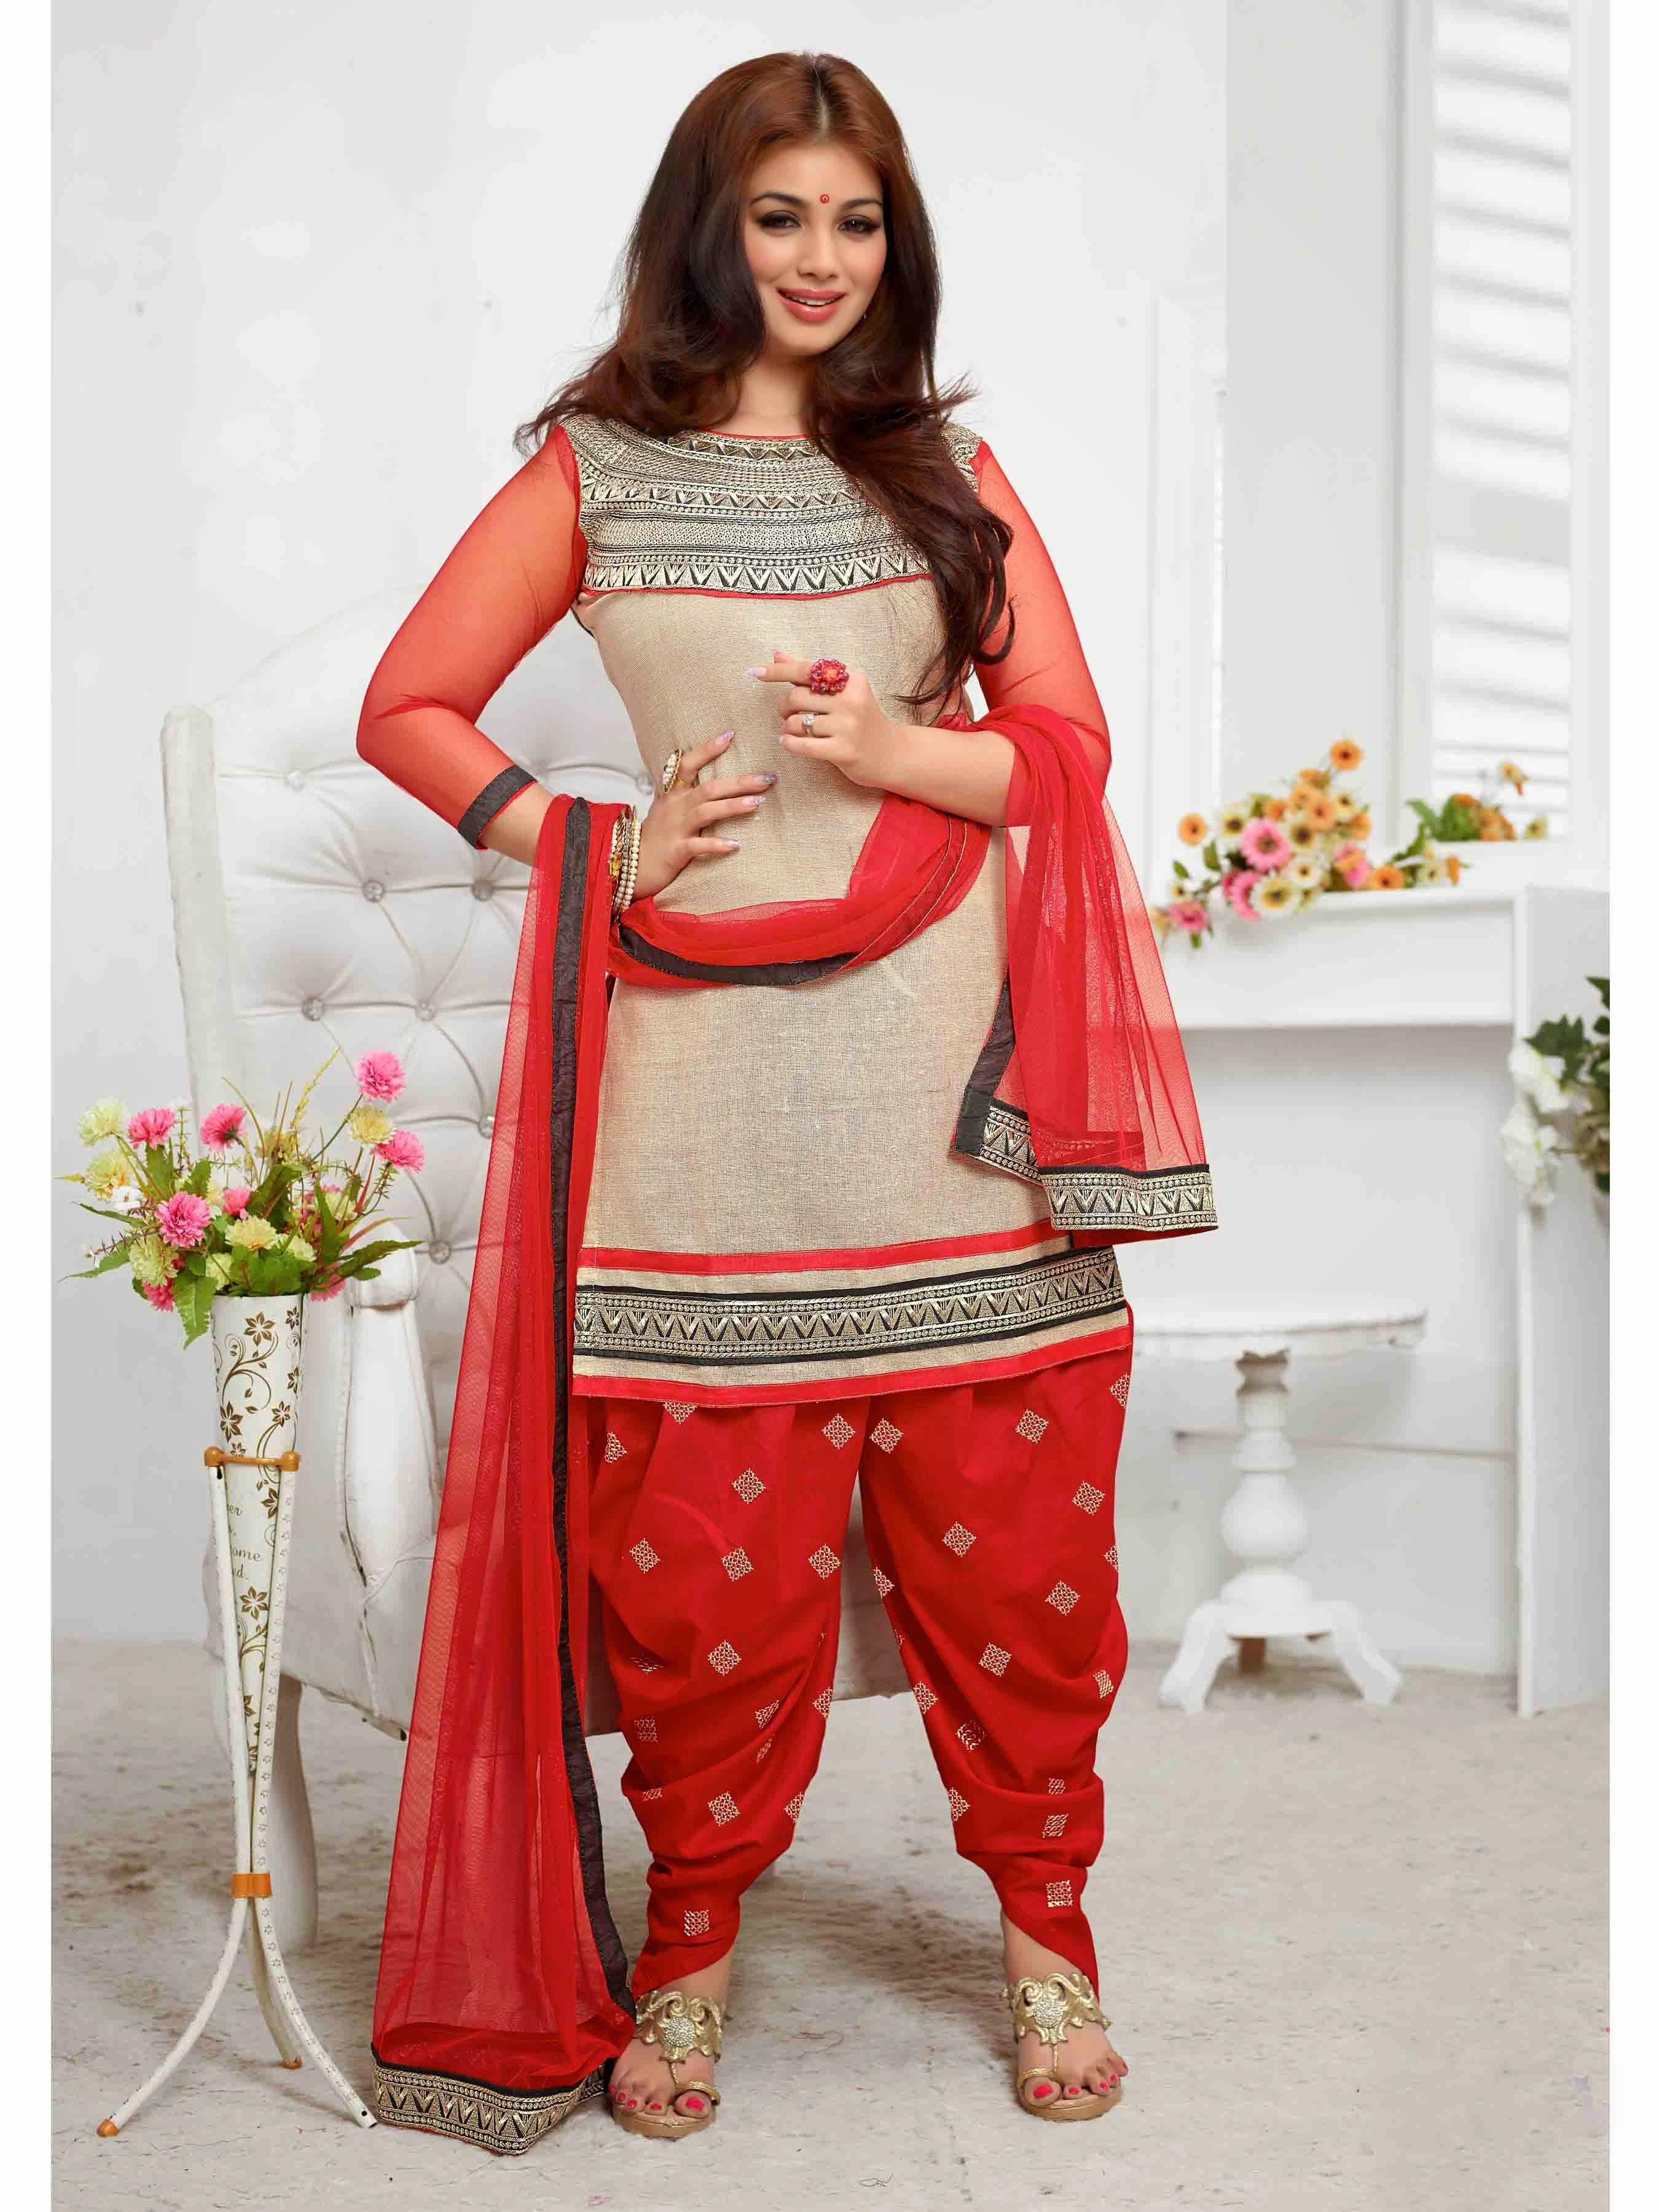 Designer salwar kameez mesmeric peach color net designer suit - 5 Types Of Salwar Kameez To Fit You Surprisingly Well